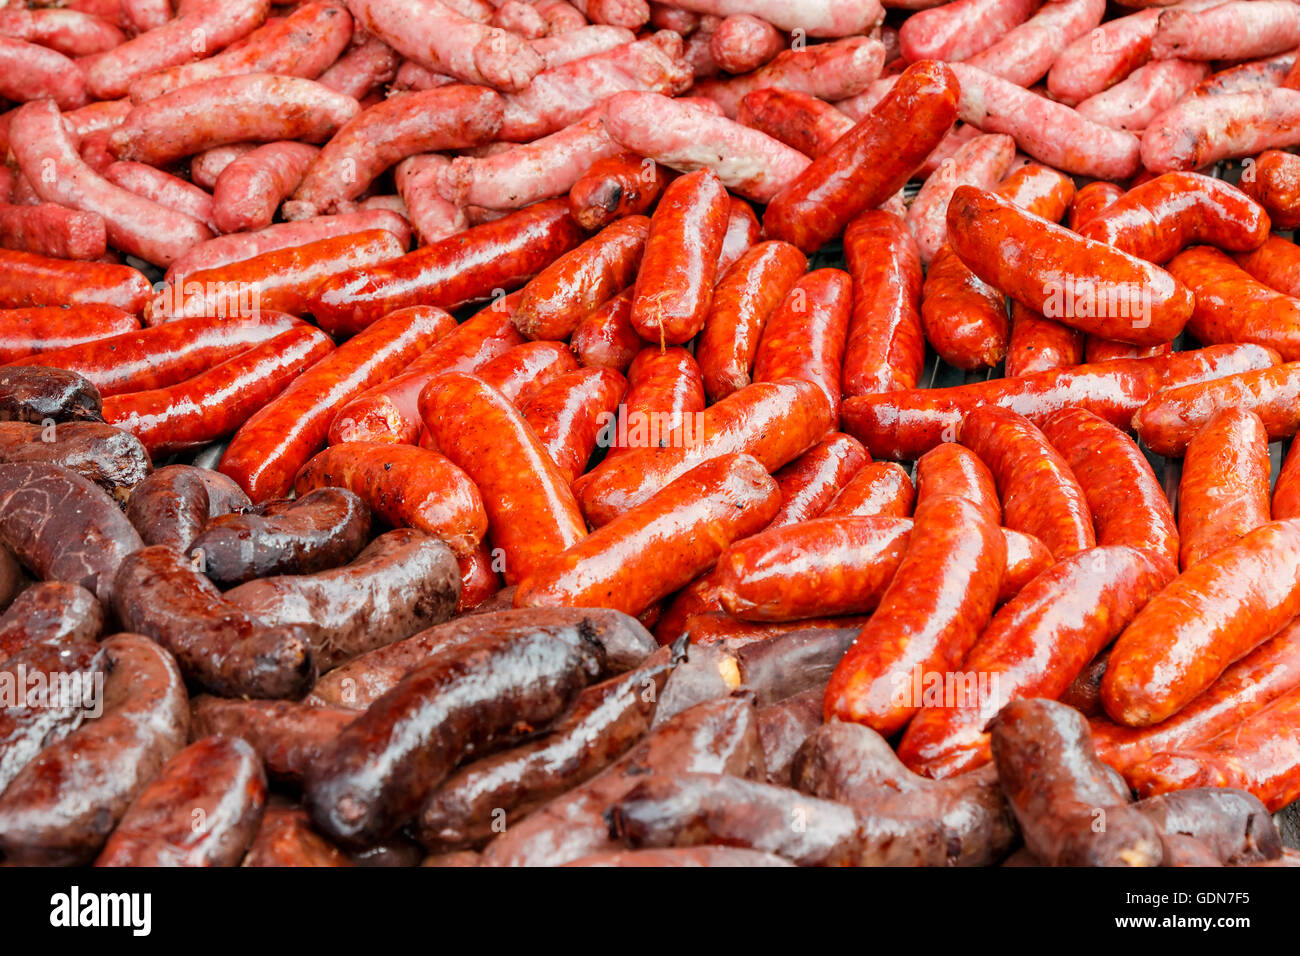 Sausage detail on a traditional craftsman market.Horizontal image. - Stock Image